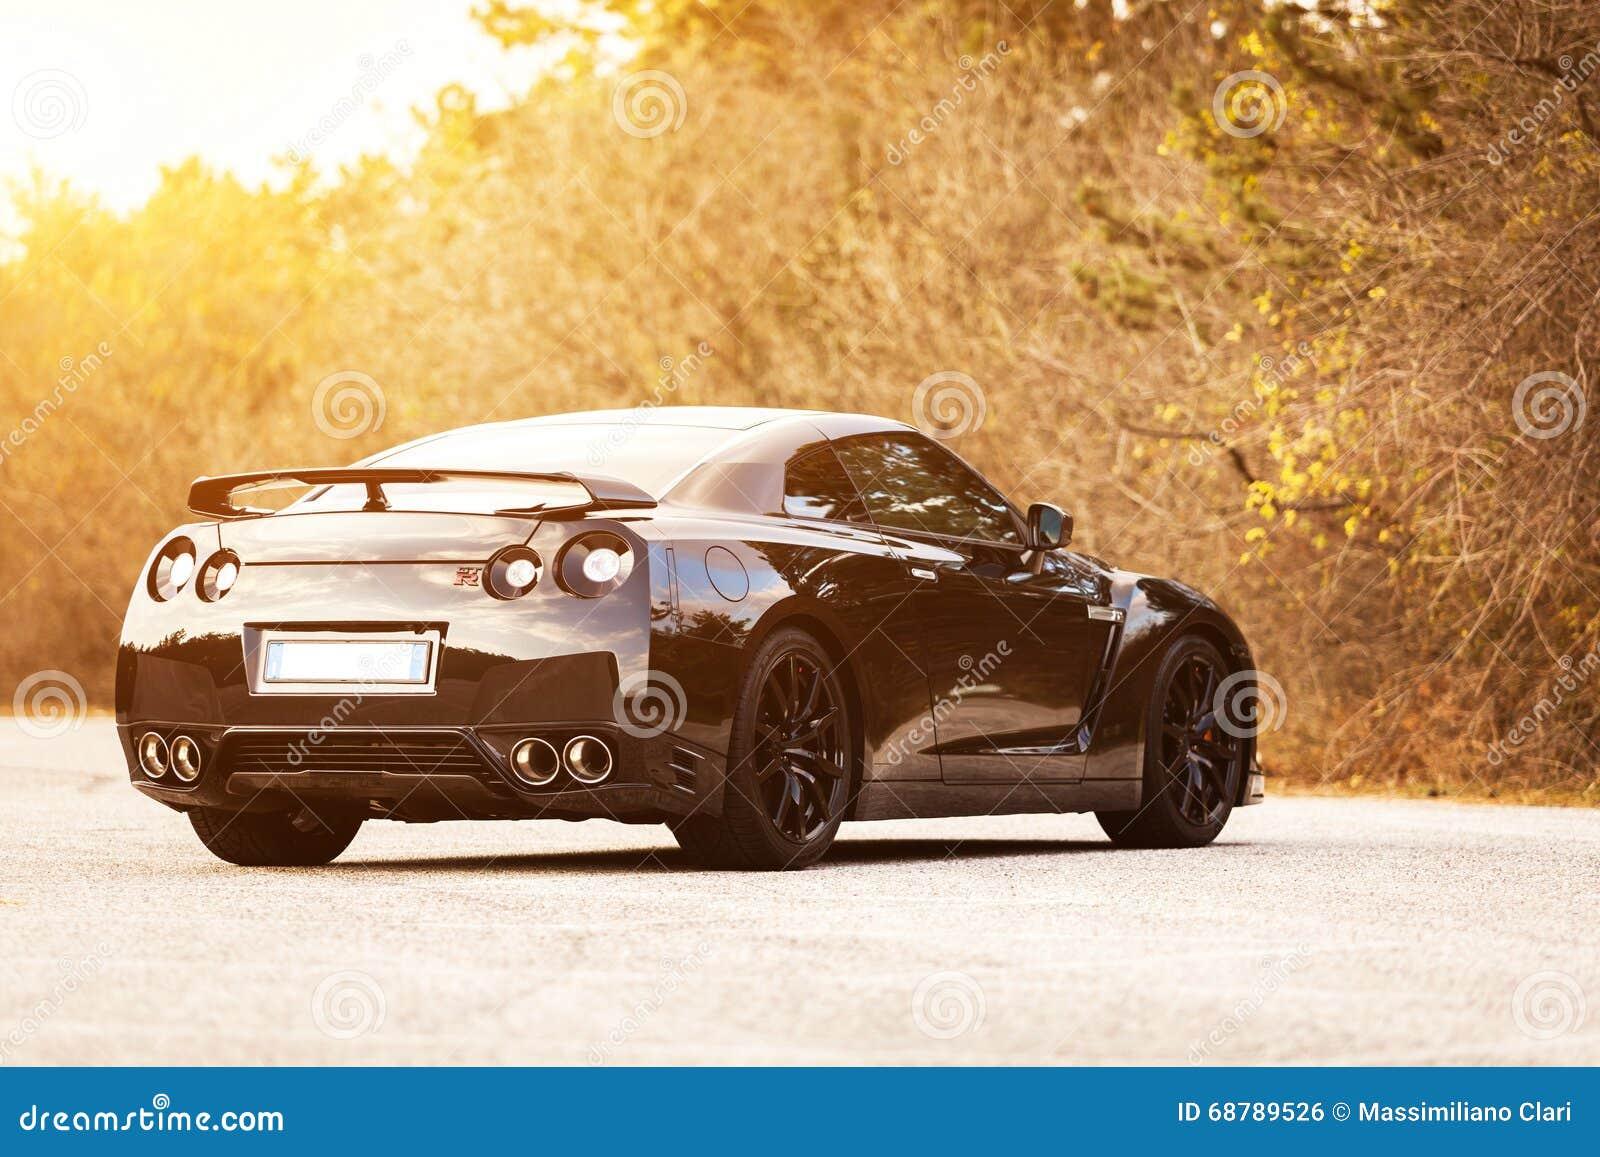 Nissan Gtr Black Edition Editorial Photo Image Of Shiny 68789526